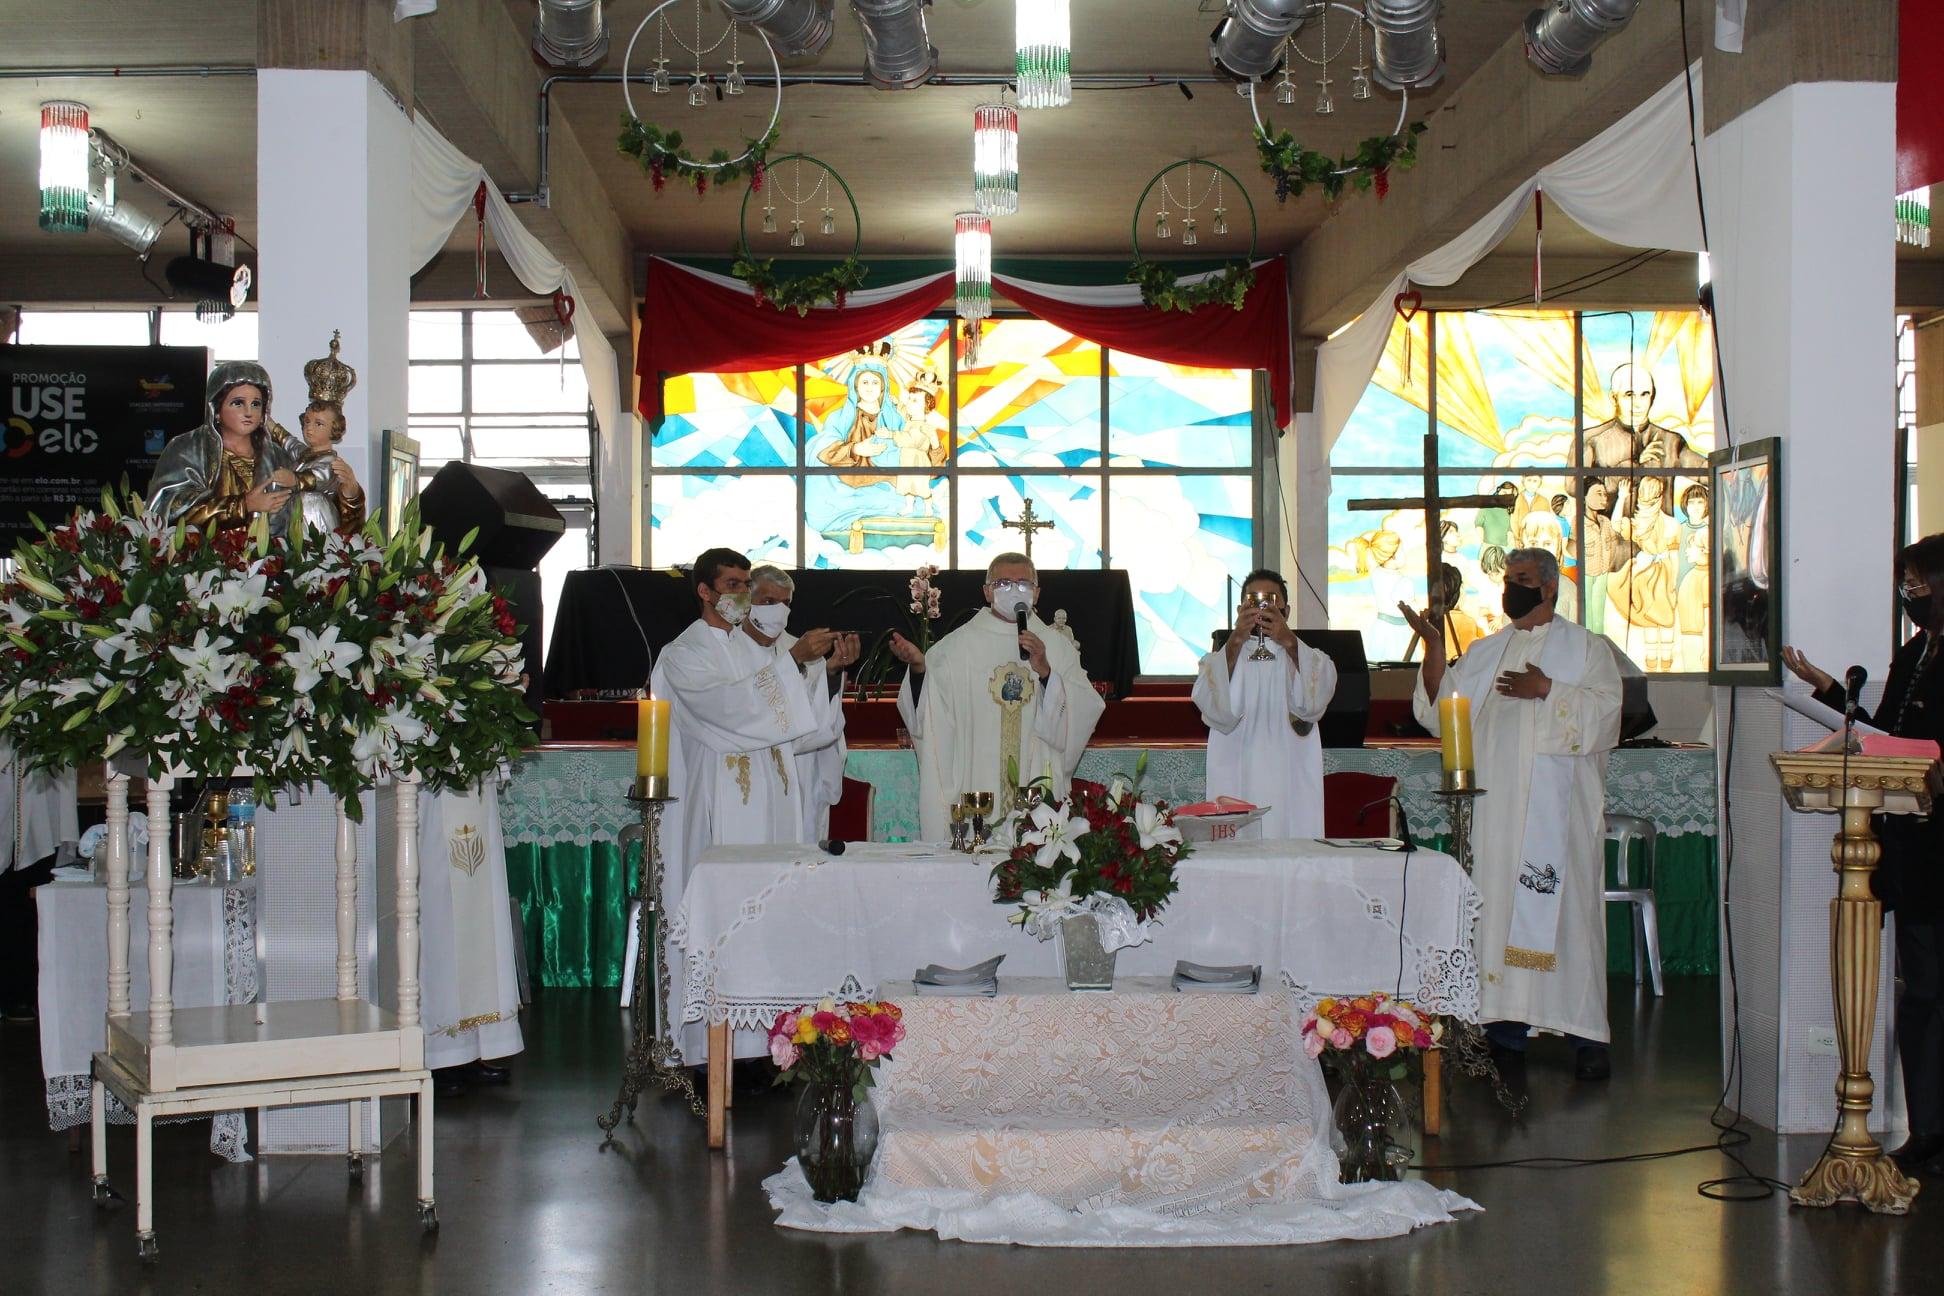 04-95-Festa-Missa-e-Coroacao-2